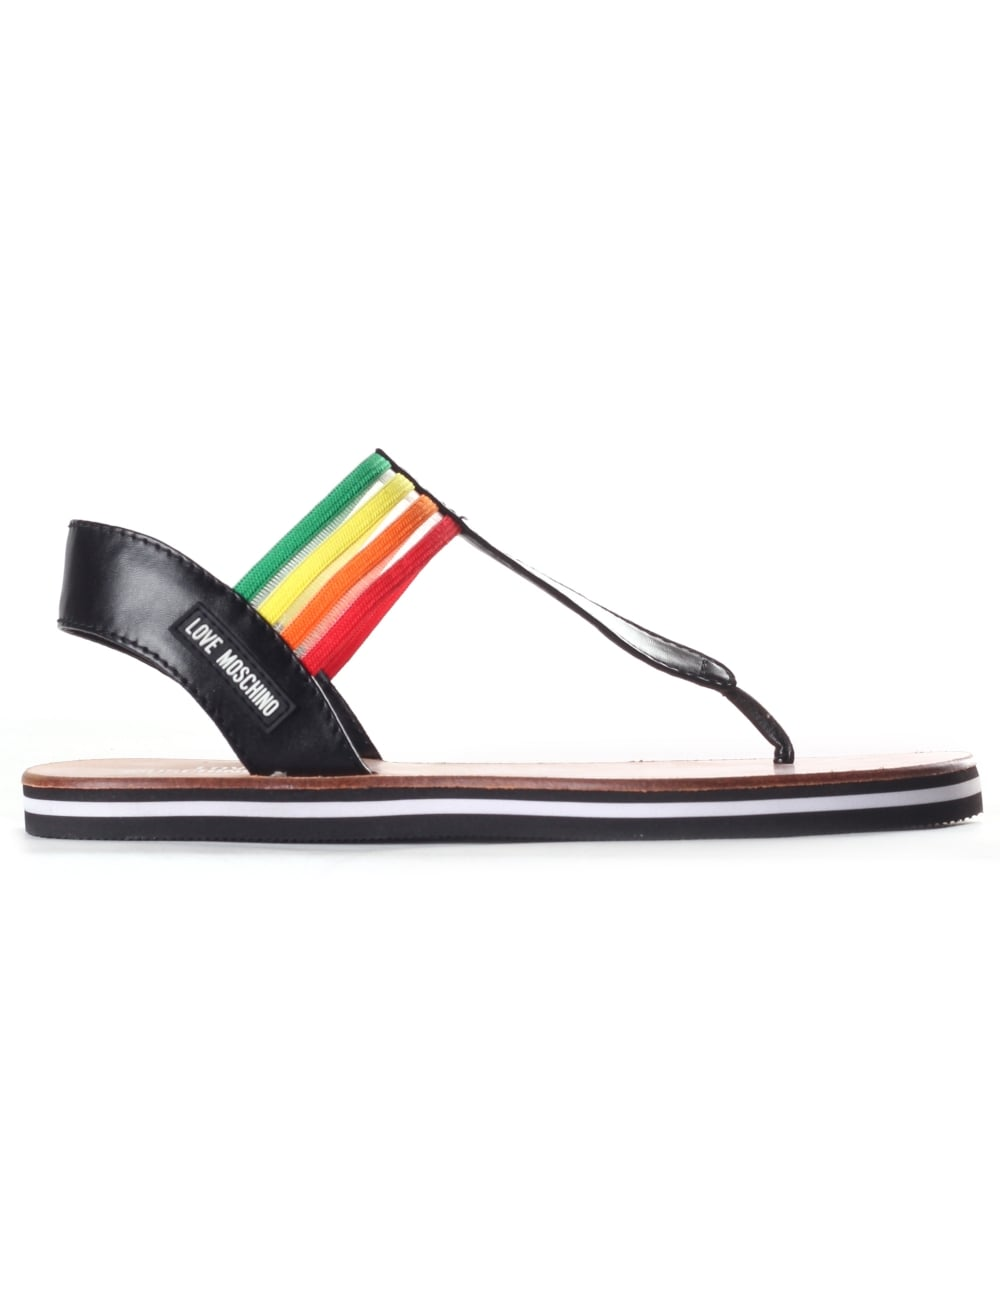 2f7fc4eb63dc Love Moschino Women s Rainbow Sandals